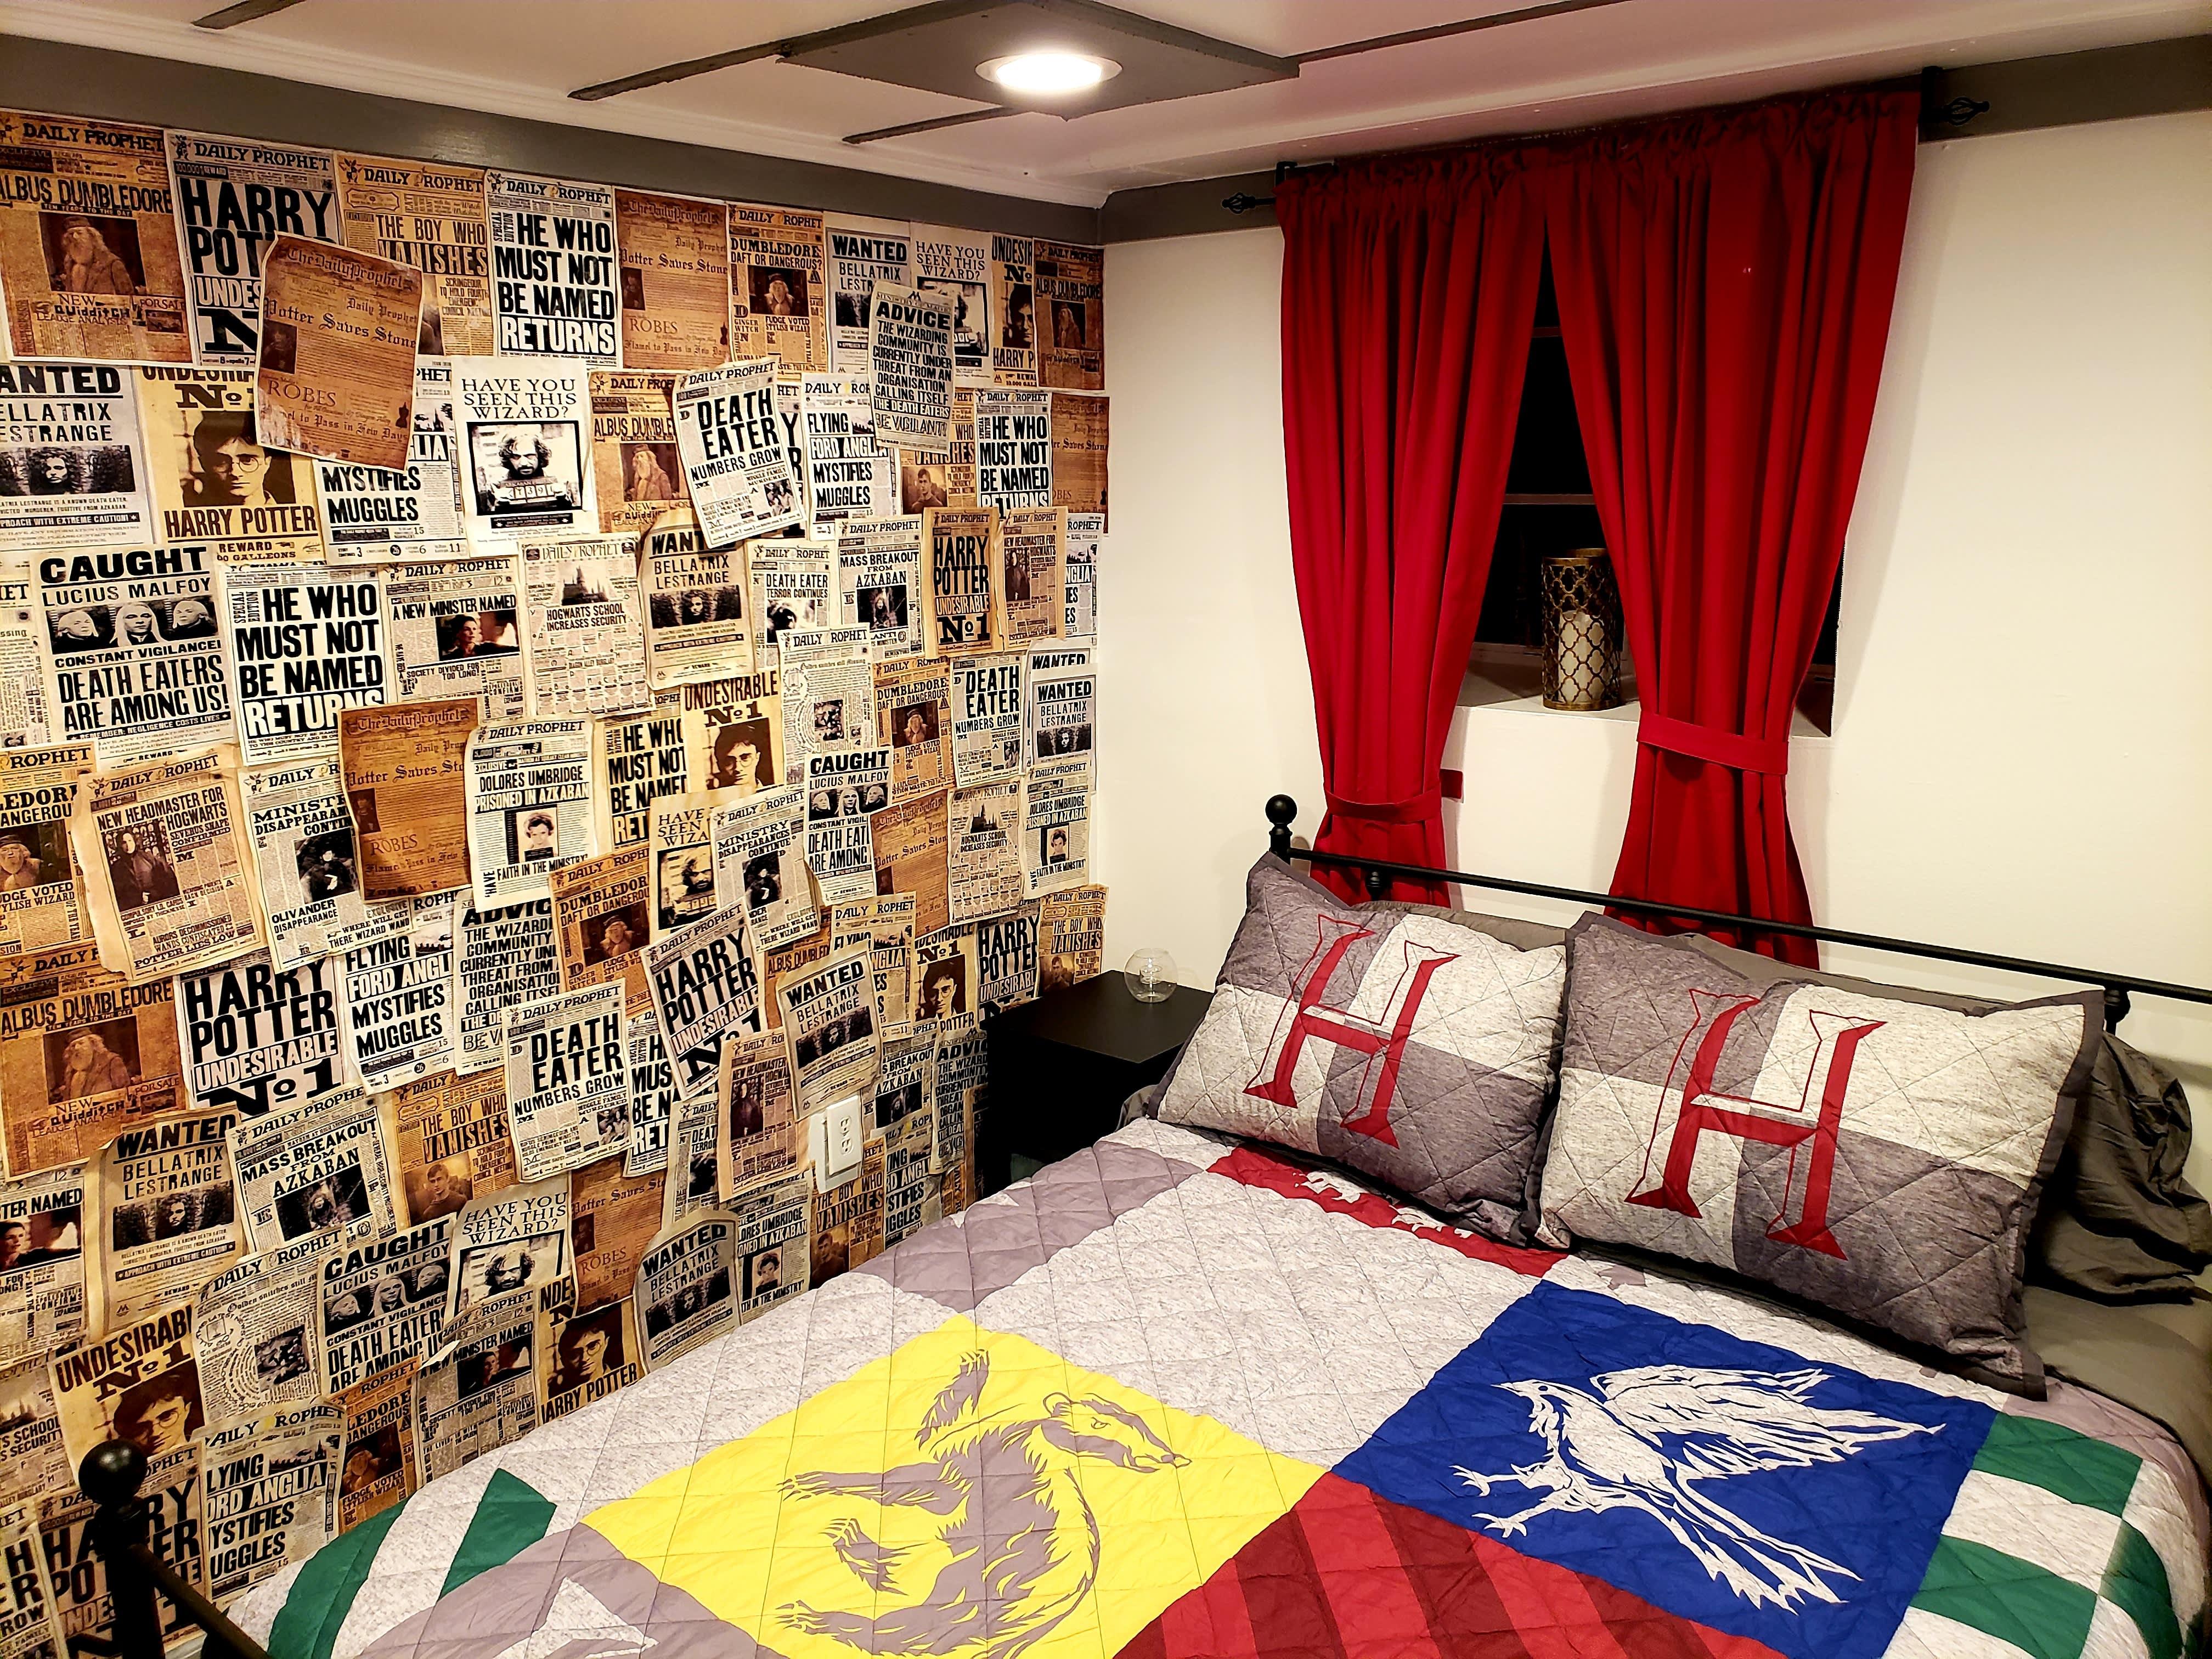 Harry Potter Airbnb Atlanta - HD Wallpaper